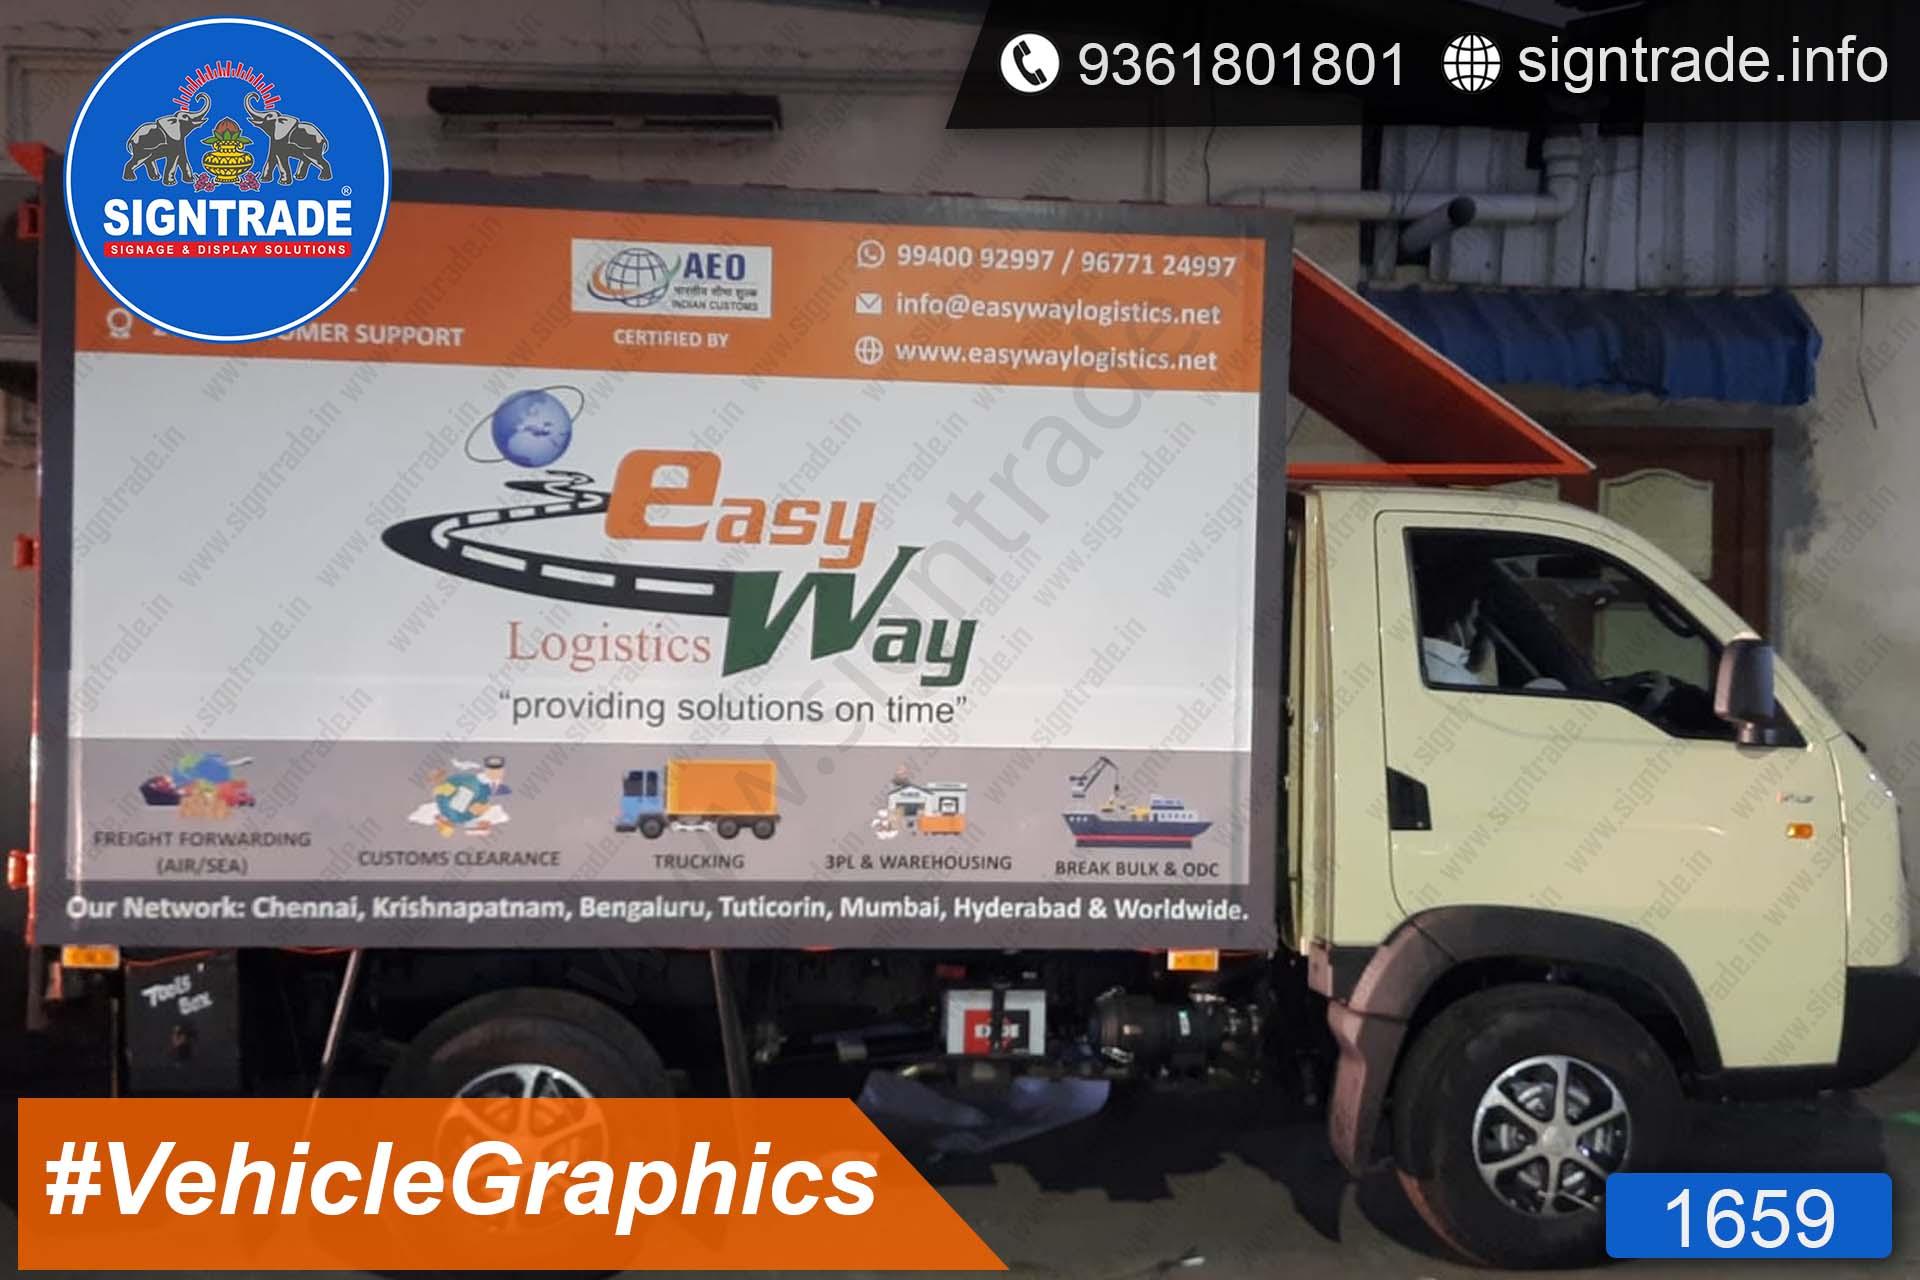 EasyWay Logistics, Chennai - SIGNTRADE - Vinyl Printing, Van Graphics Service in Chennai